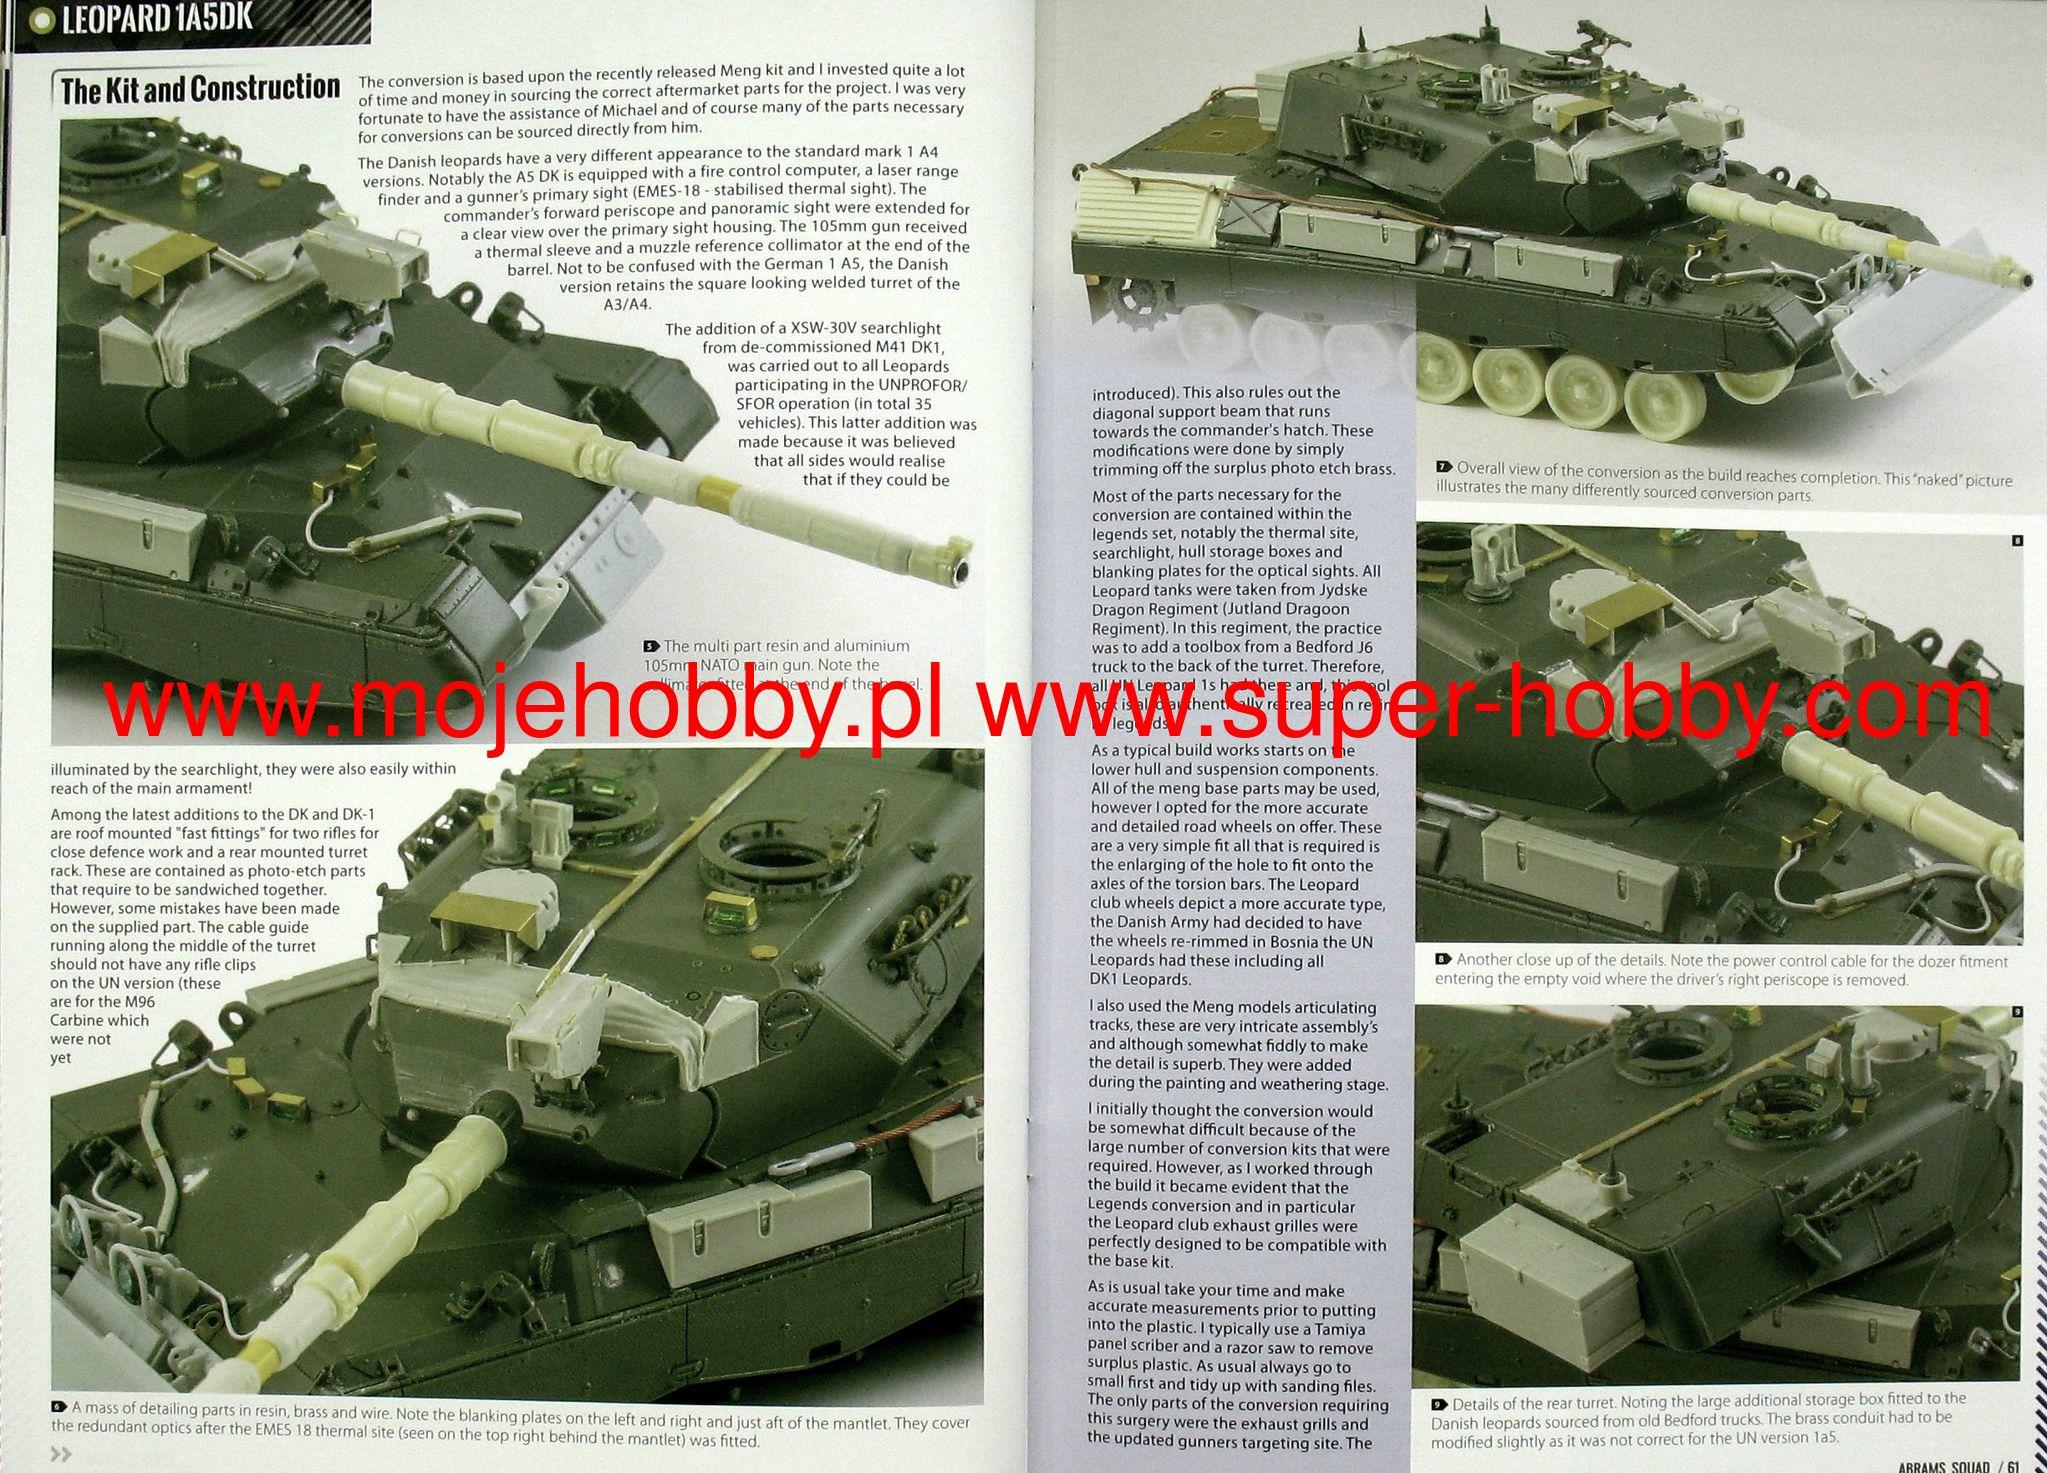 Abrams Squad nr 17 - 2 Tusk Academy RMF, Shilka Diorama, Leopard 1A5DK,  BTR-80, M-ATV, EITAN First images of the future 8x8 of the IDF